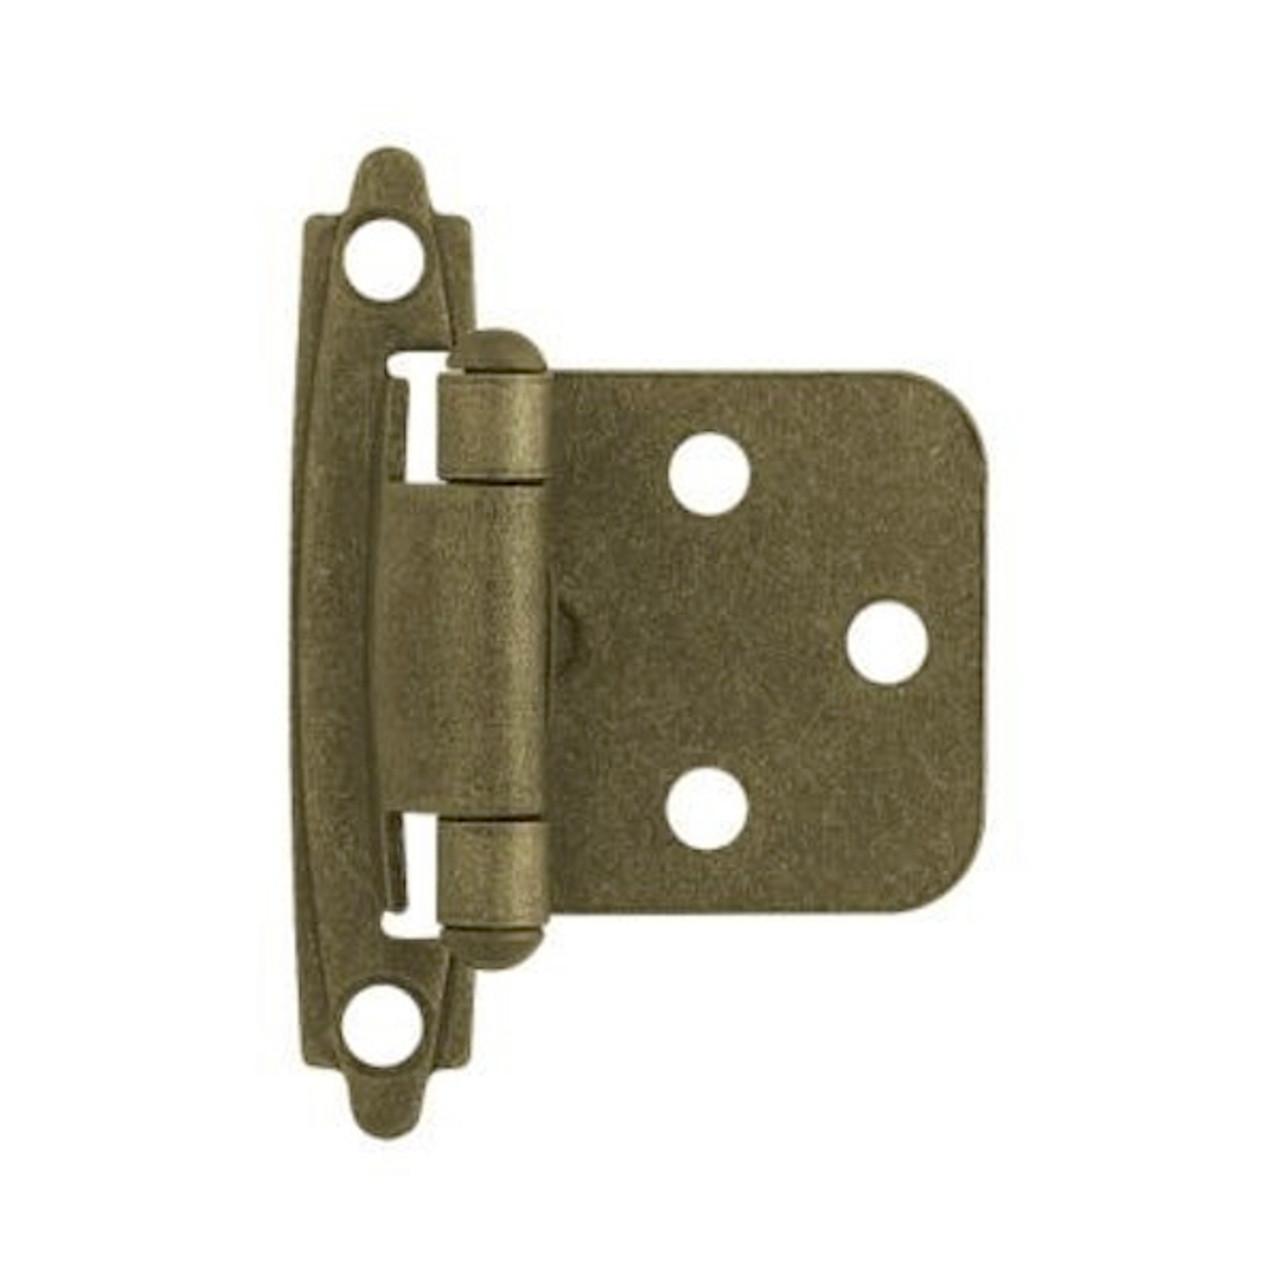 81465 Antique Brass Self Closing Overlay HInge 10 Pack